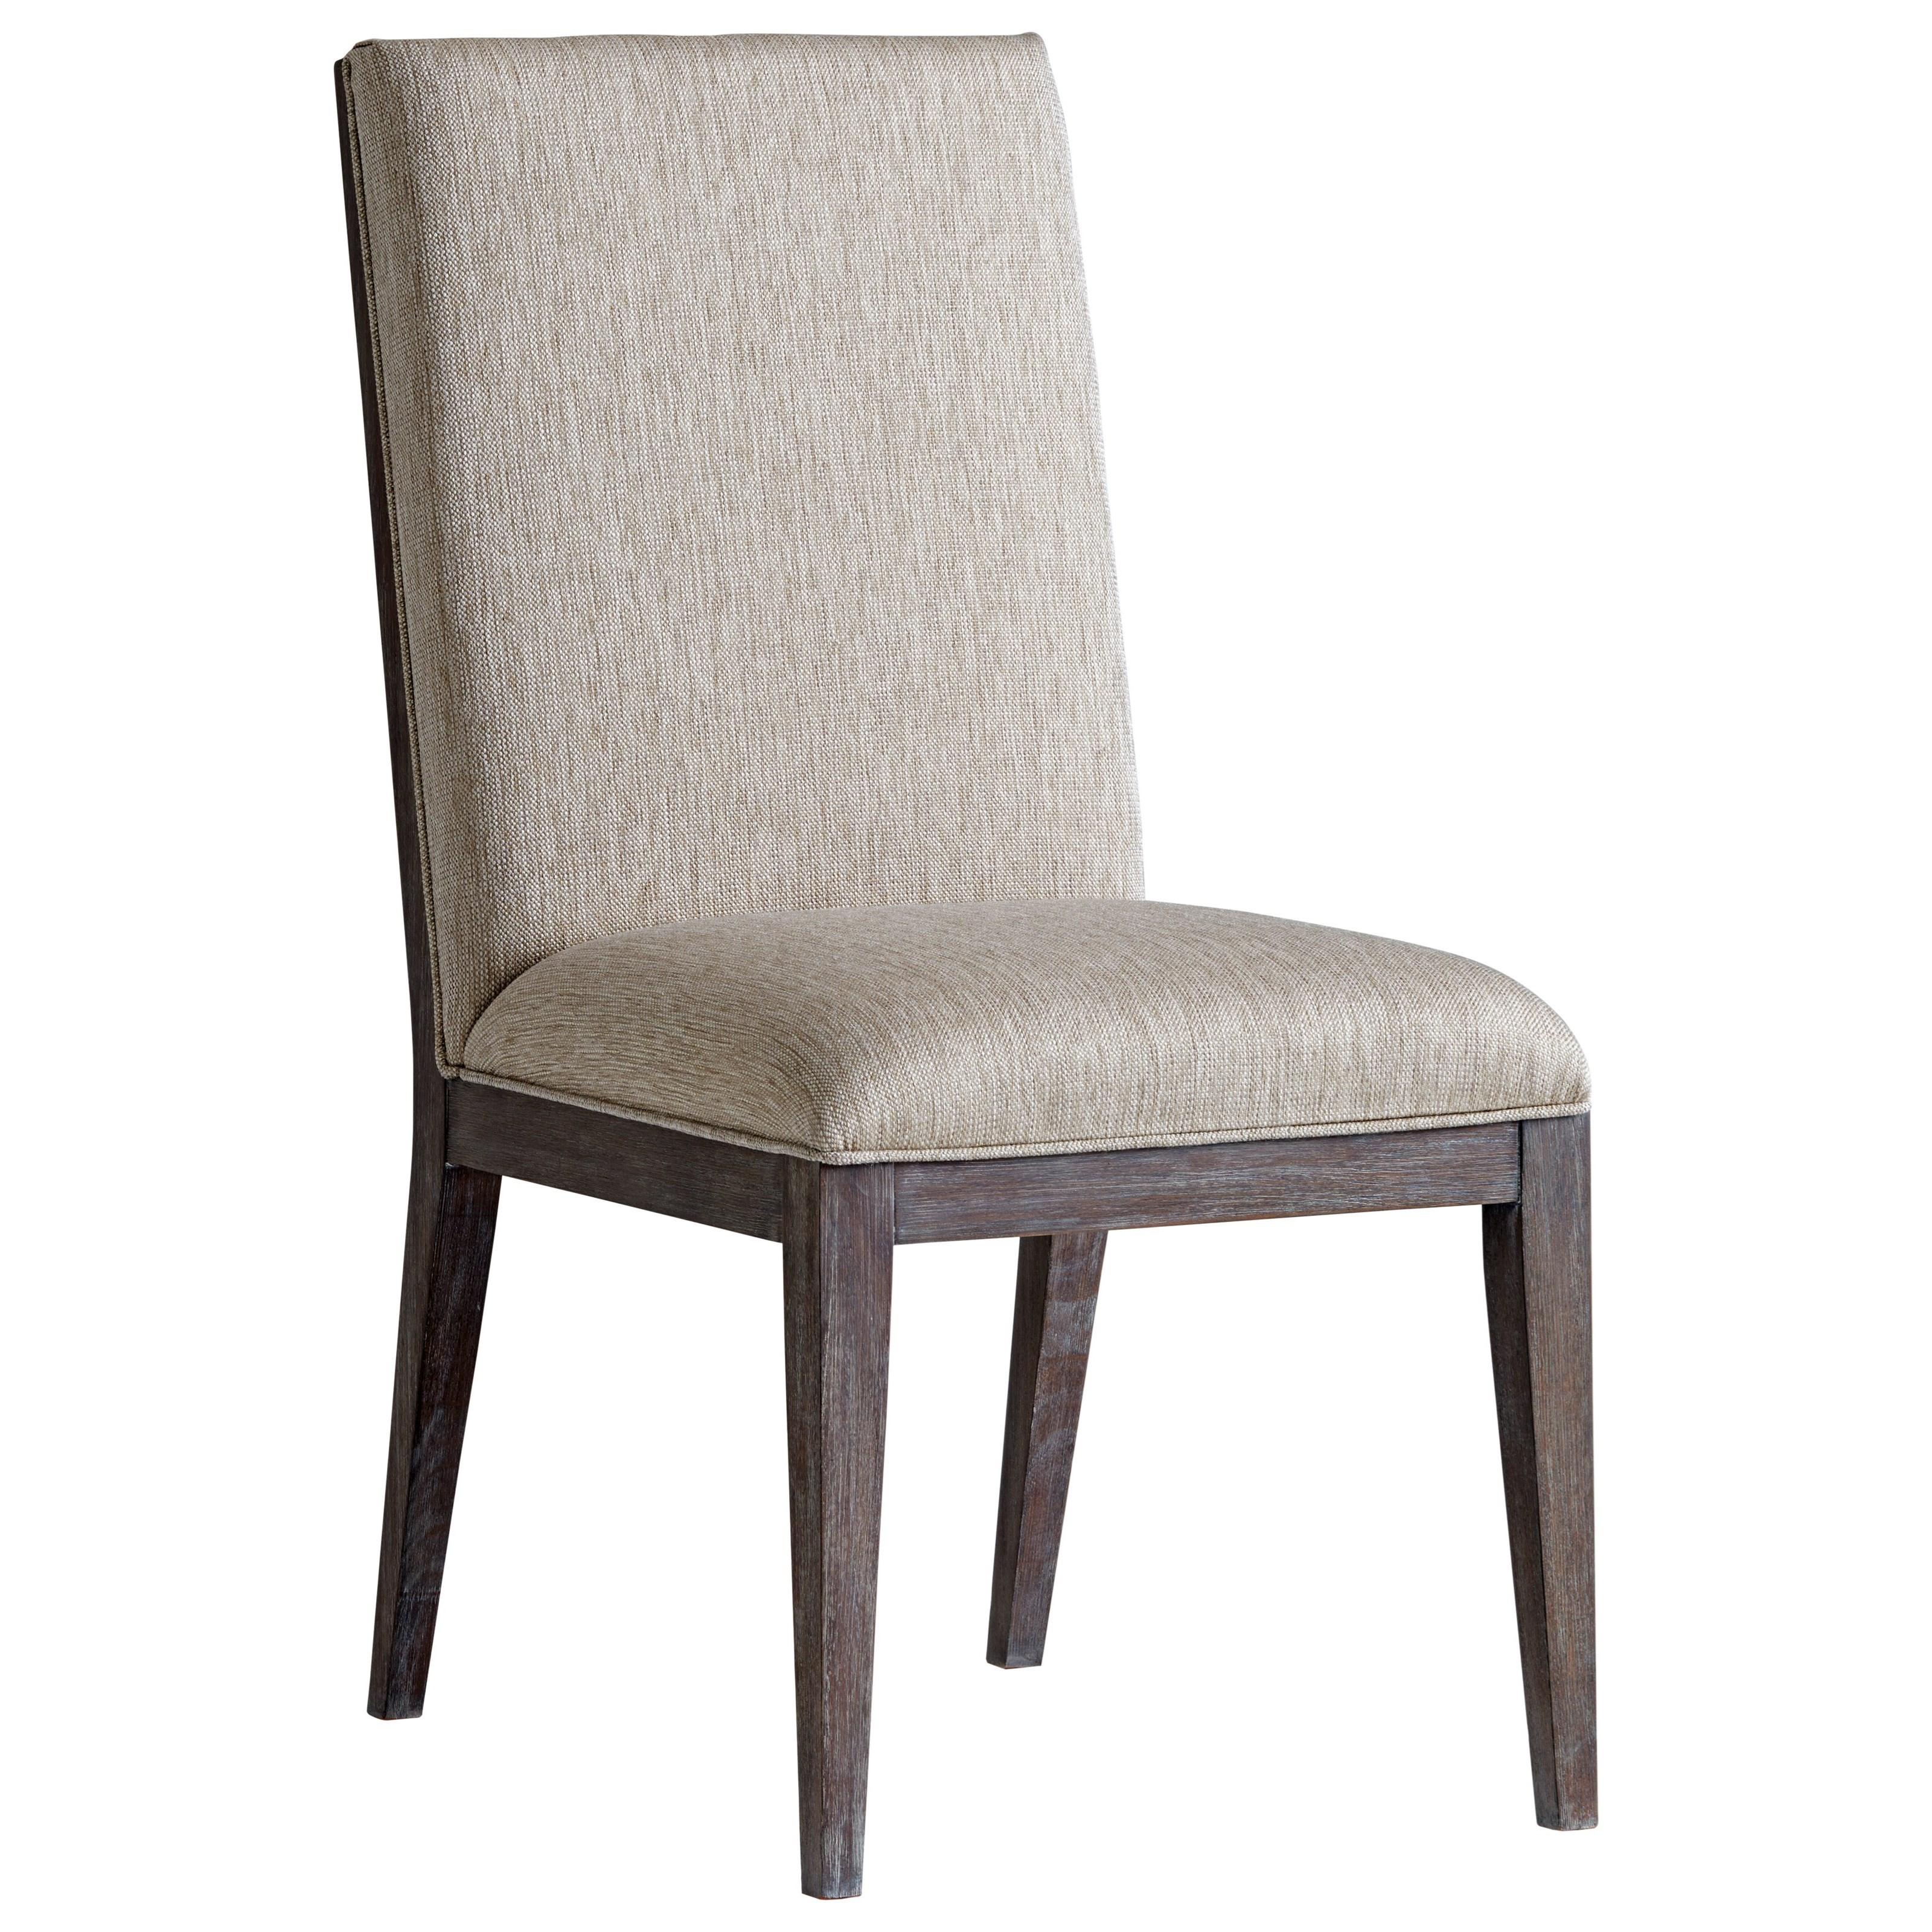 Santana Bodega Upholstered Side Chair  by Lexington at Johnny Janosik